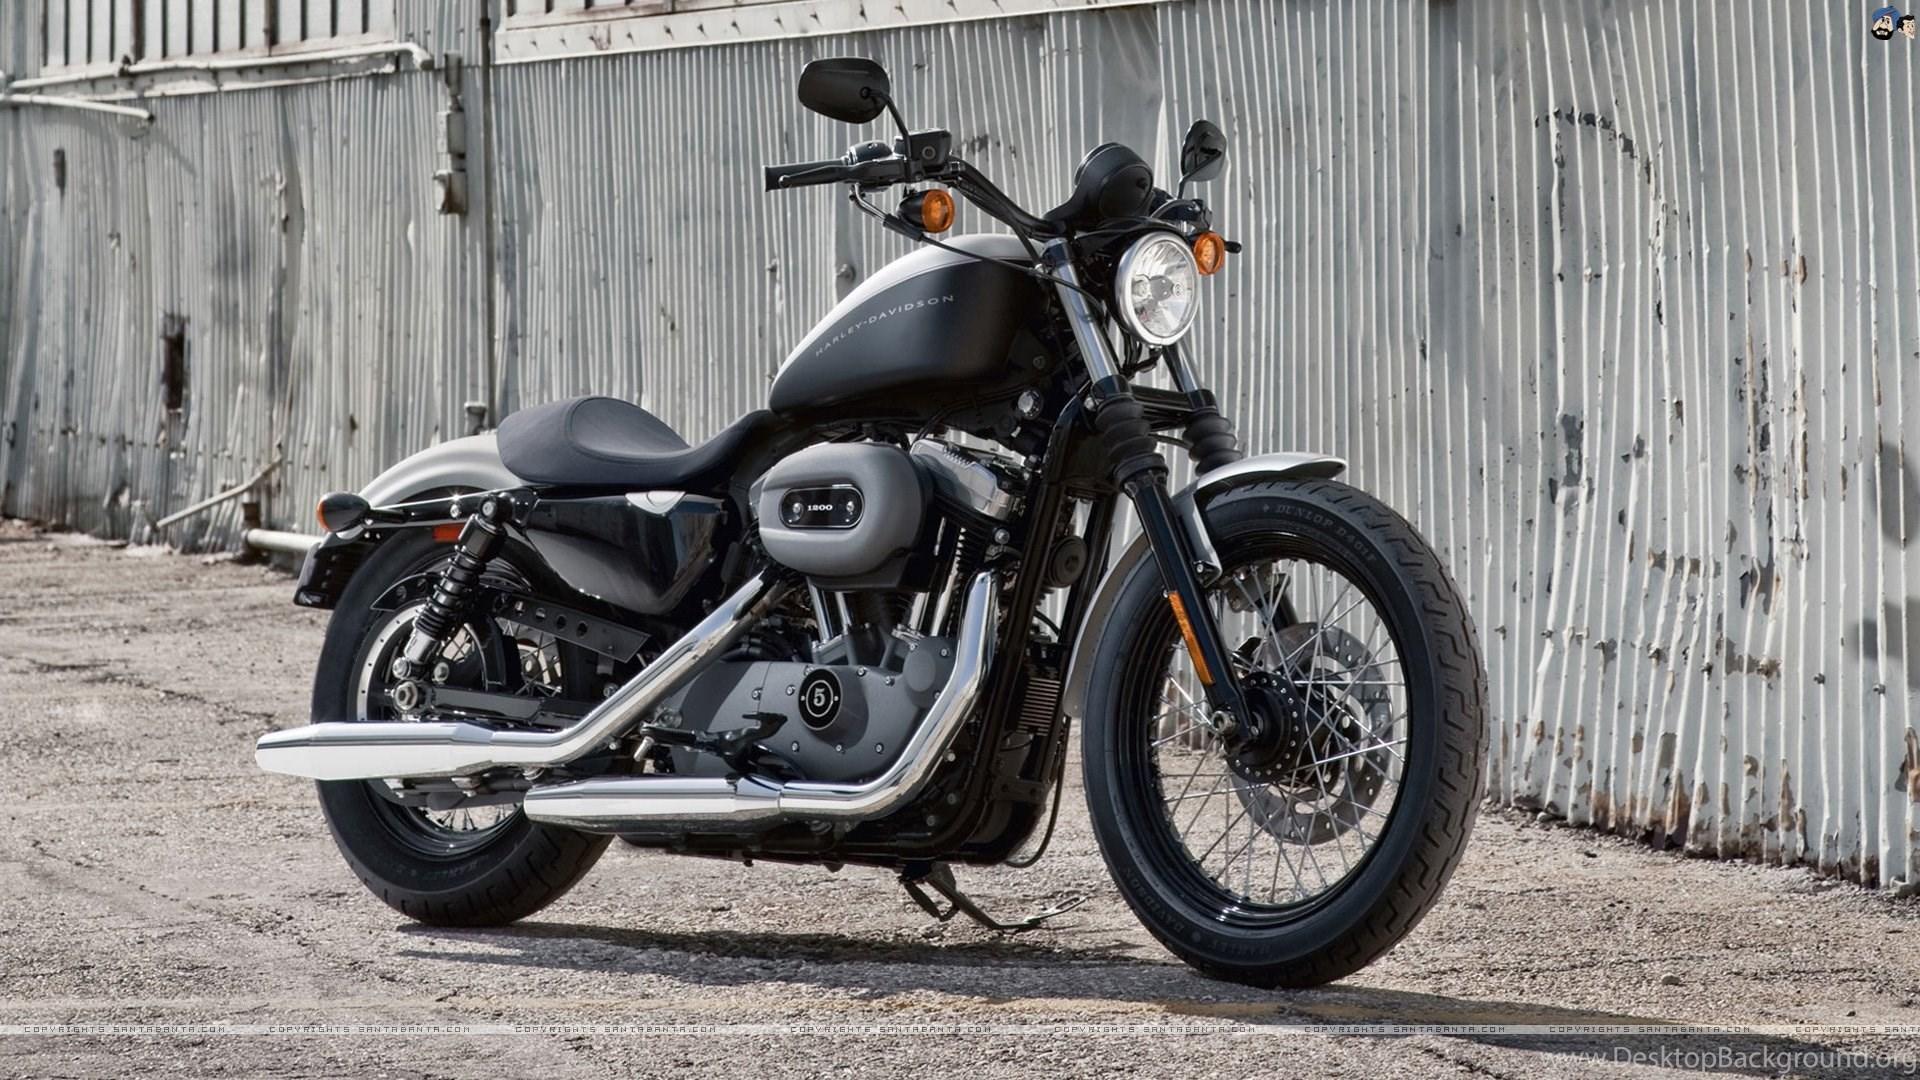 Must see Wallpaper High Resolution Harley Davidson - 1044082_high-resolution-awesome-harley-davidson-wallpapers-hd-6_1920x1080_h  Gallery_53757.jpg